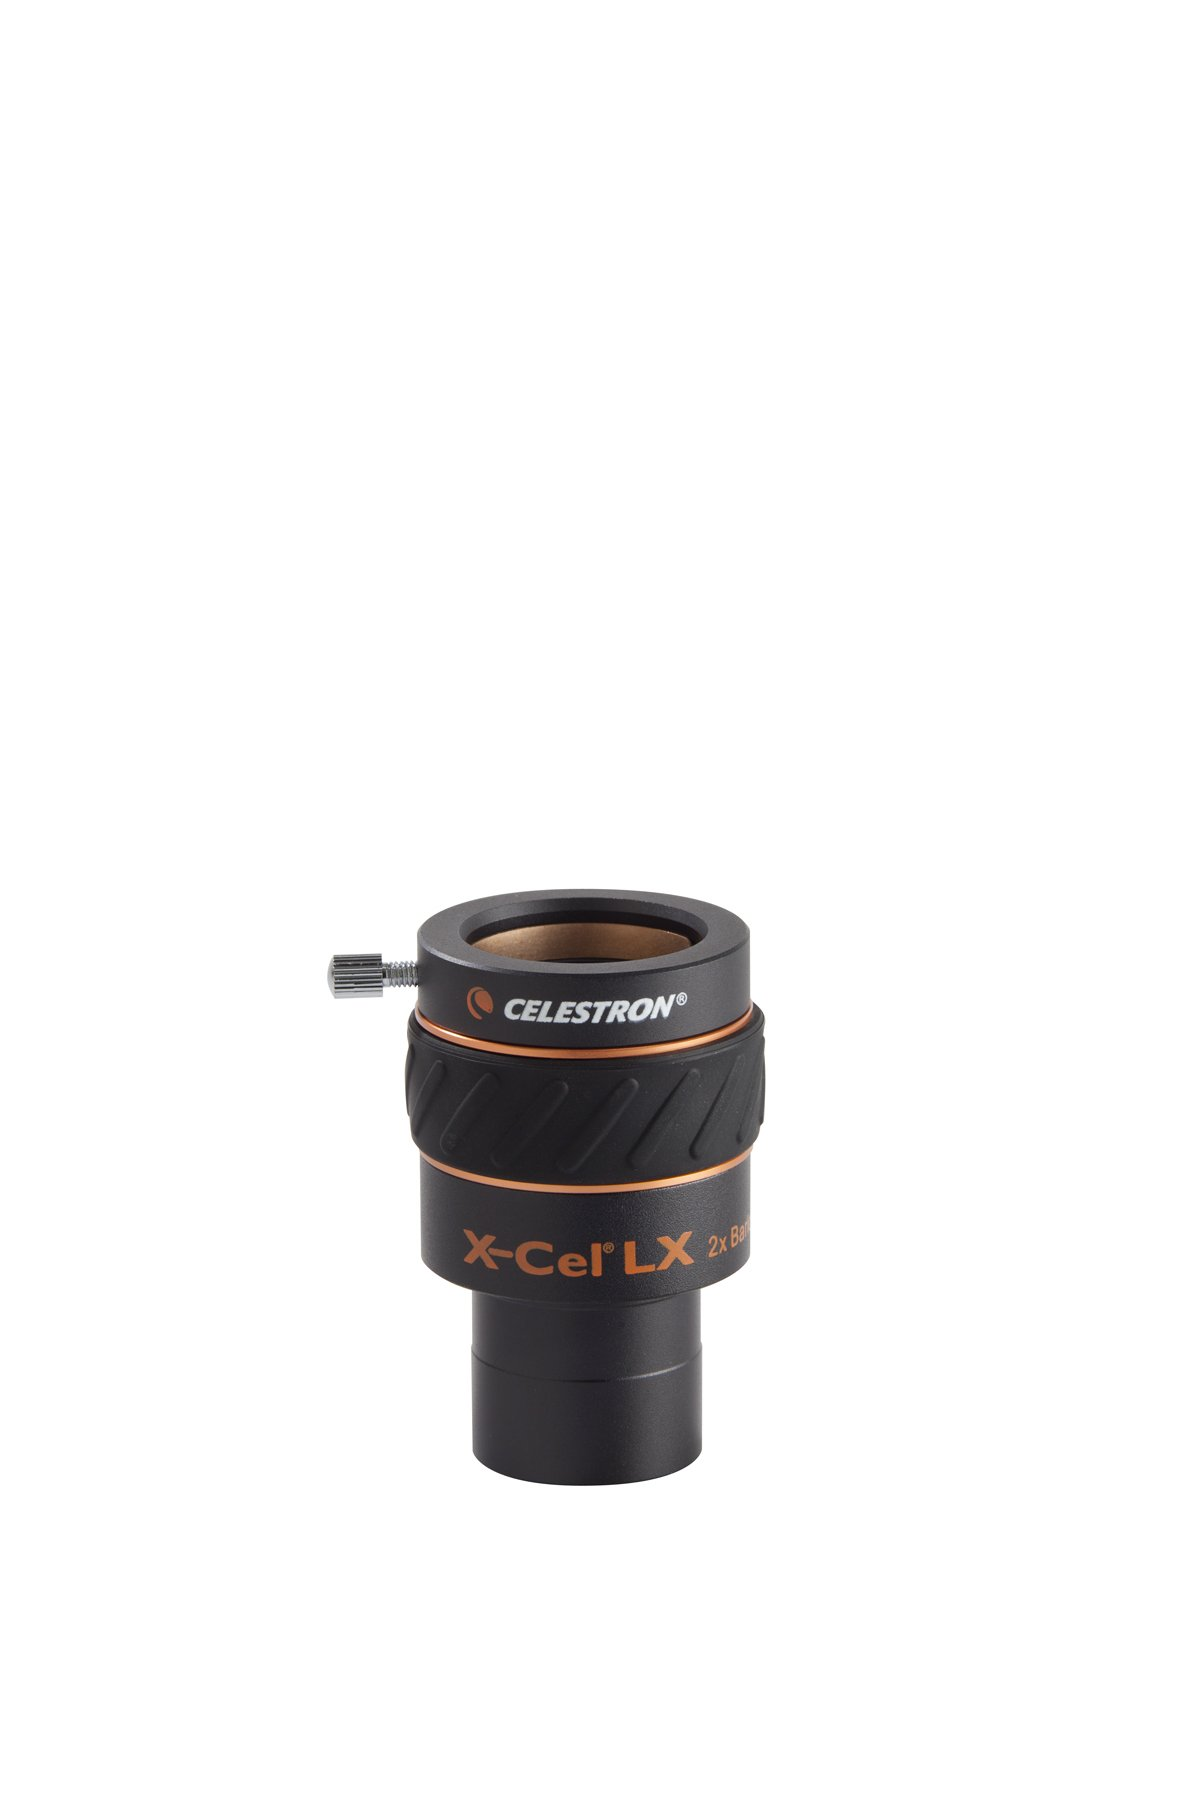 Celestron 93529 X-Cel LX 1.25-Inch 2x Barlow Lens (Black) by Celestron